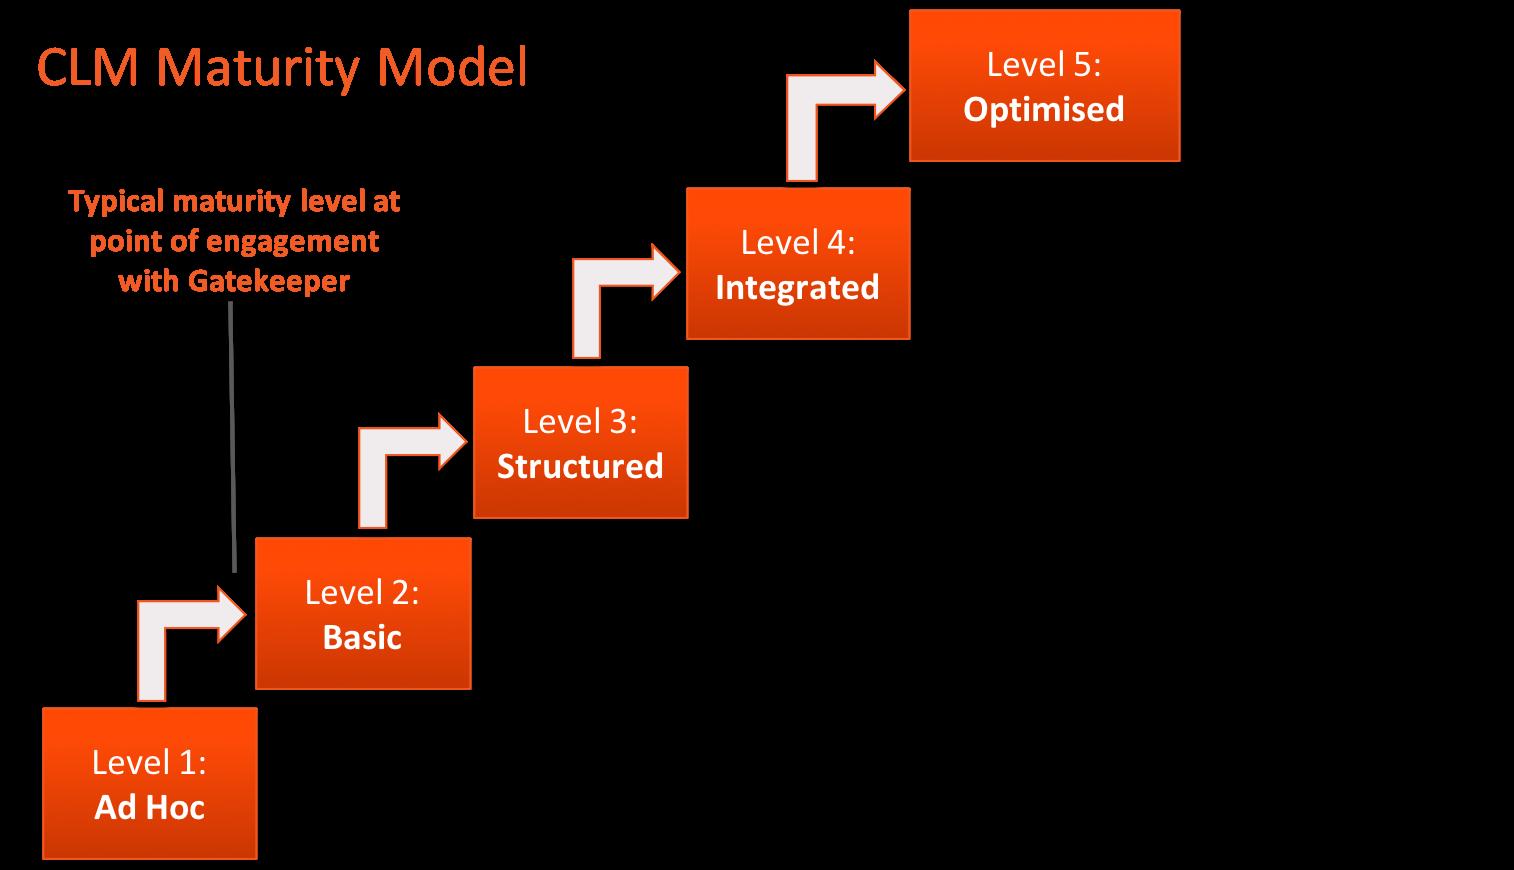 Representation of the CLM Maturity Model